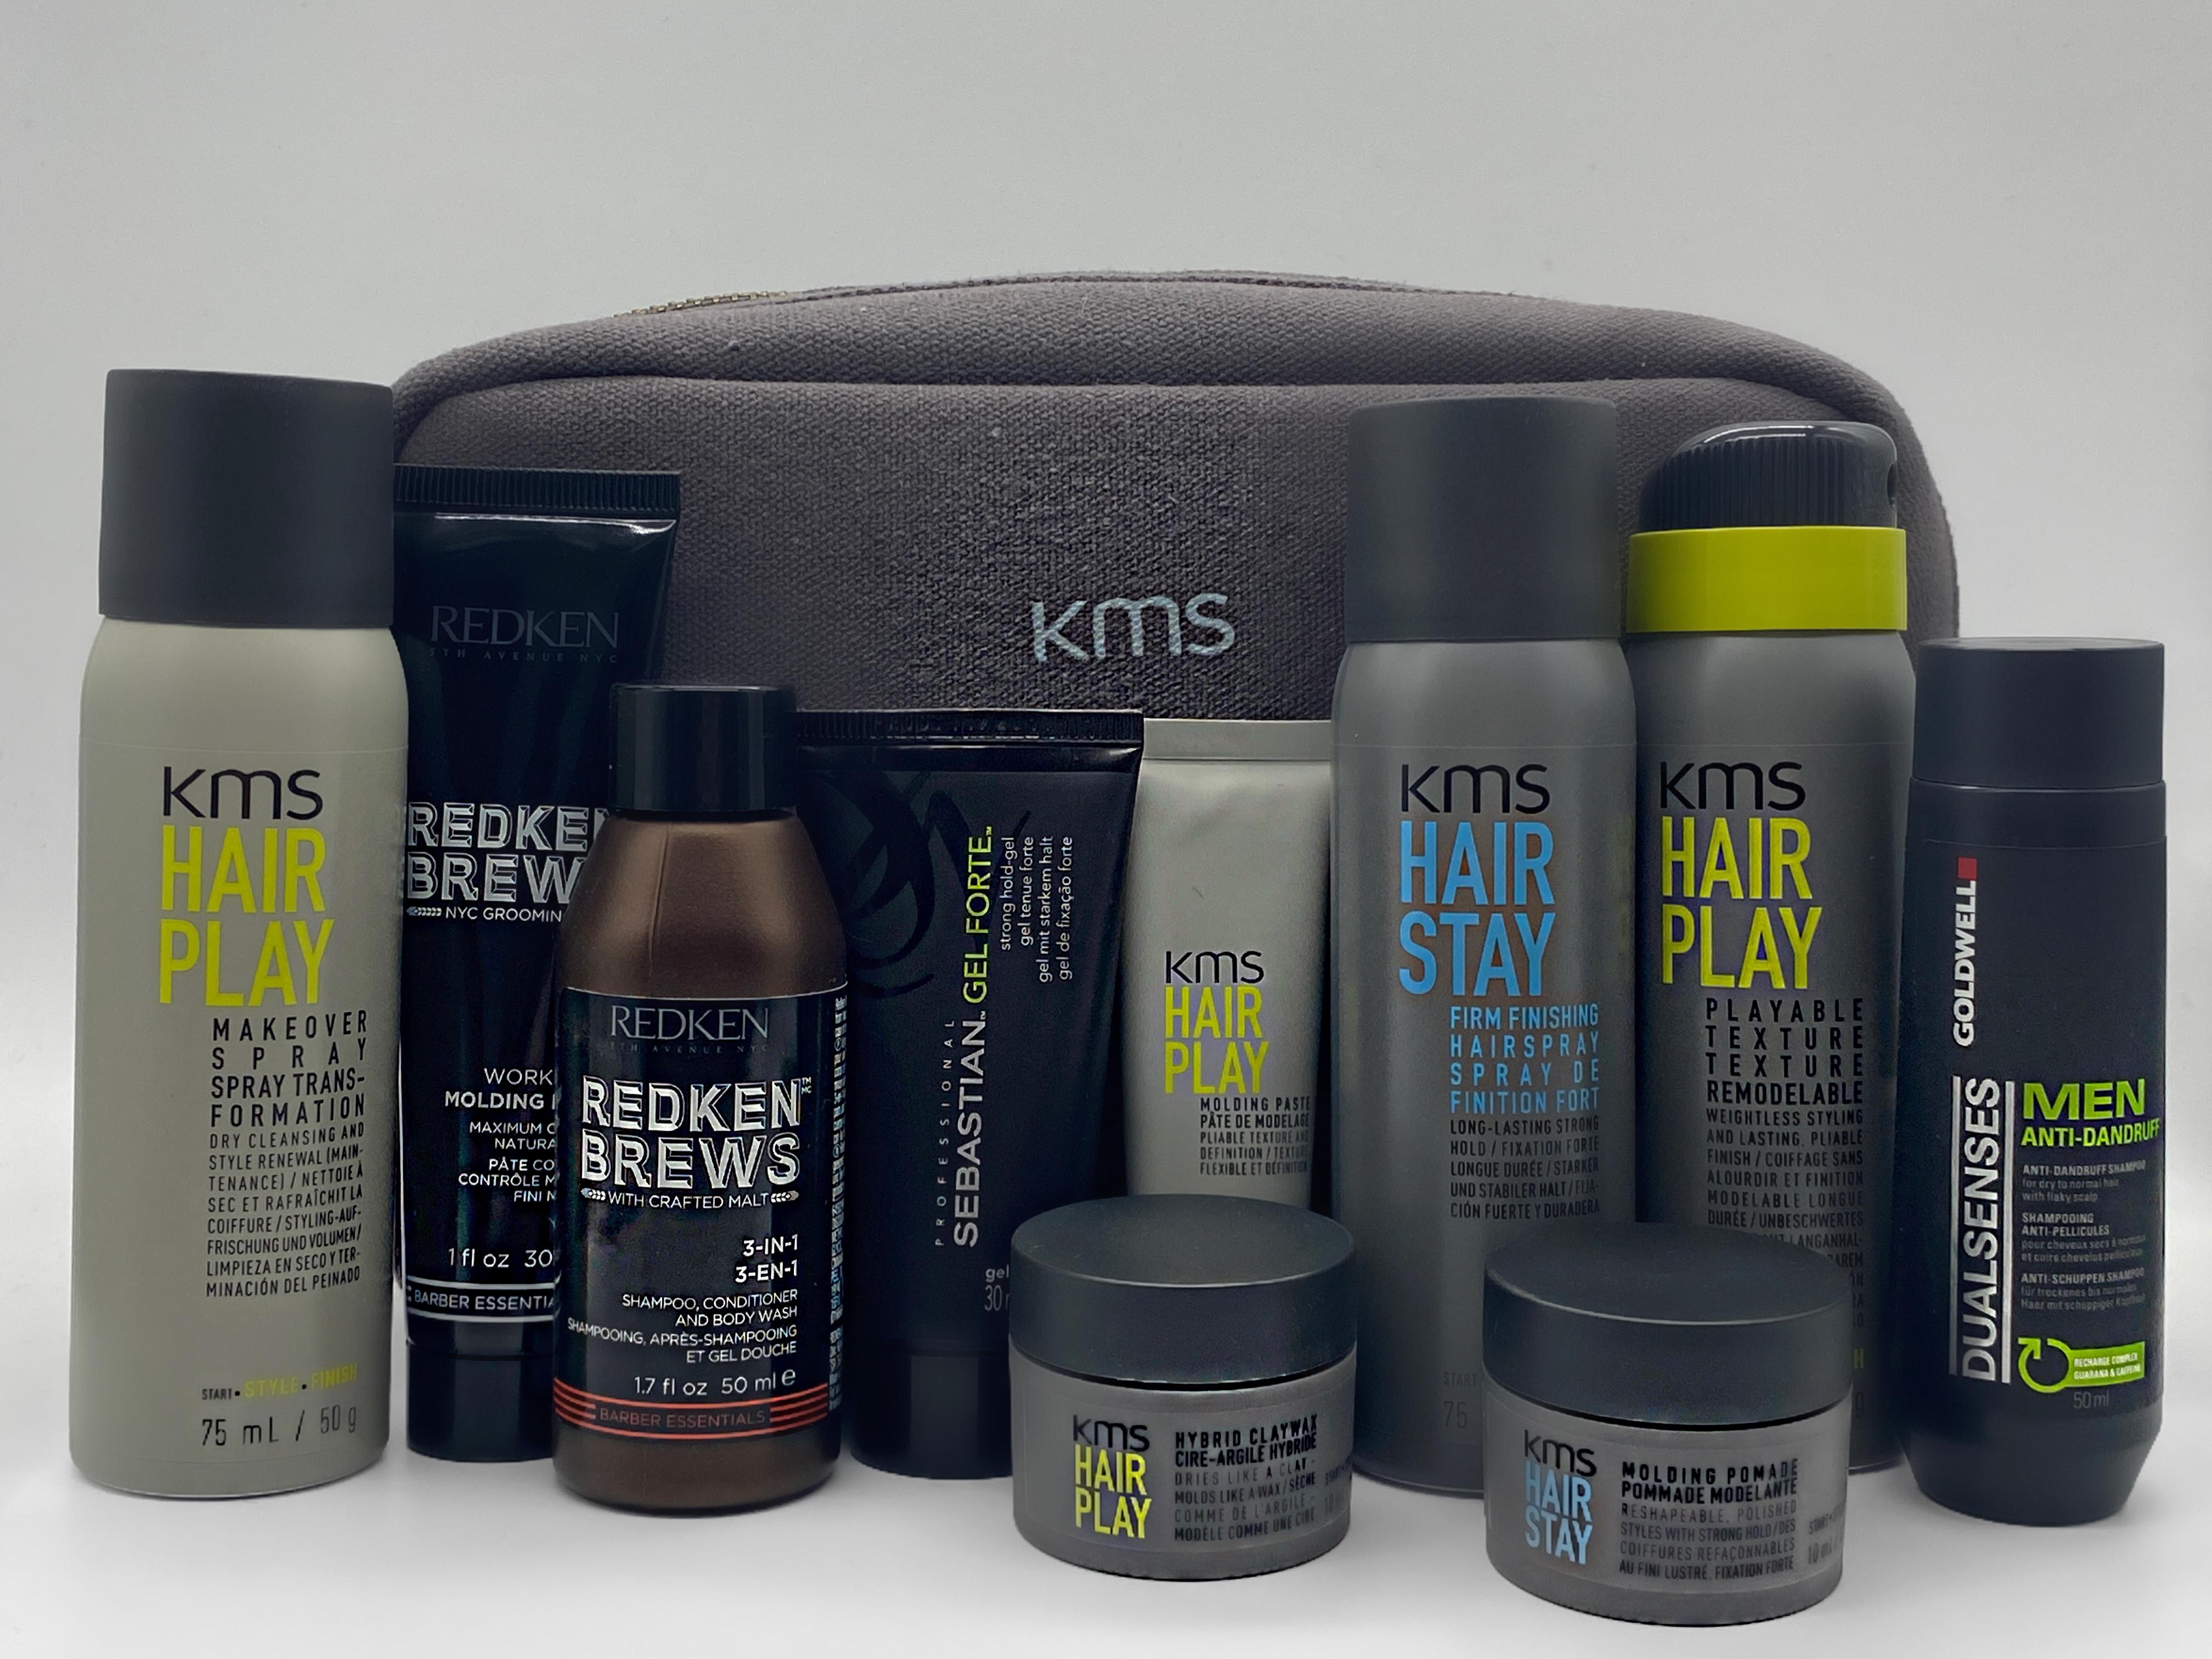 Männer Haarpflege Probierset mit KMS California Kulturbeutel